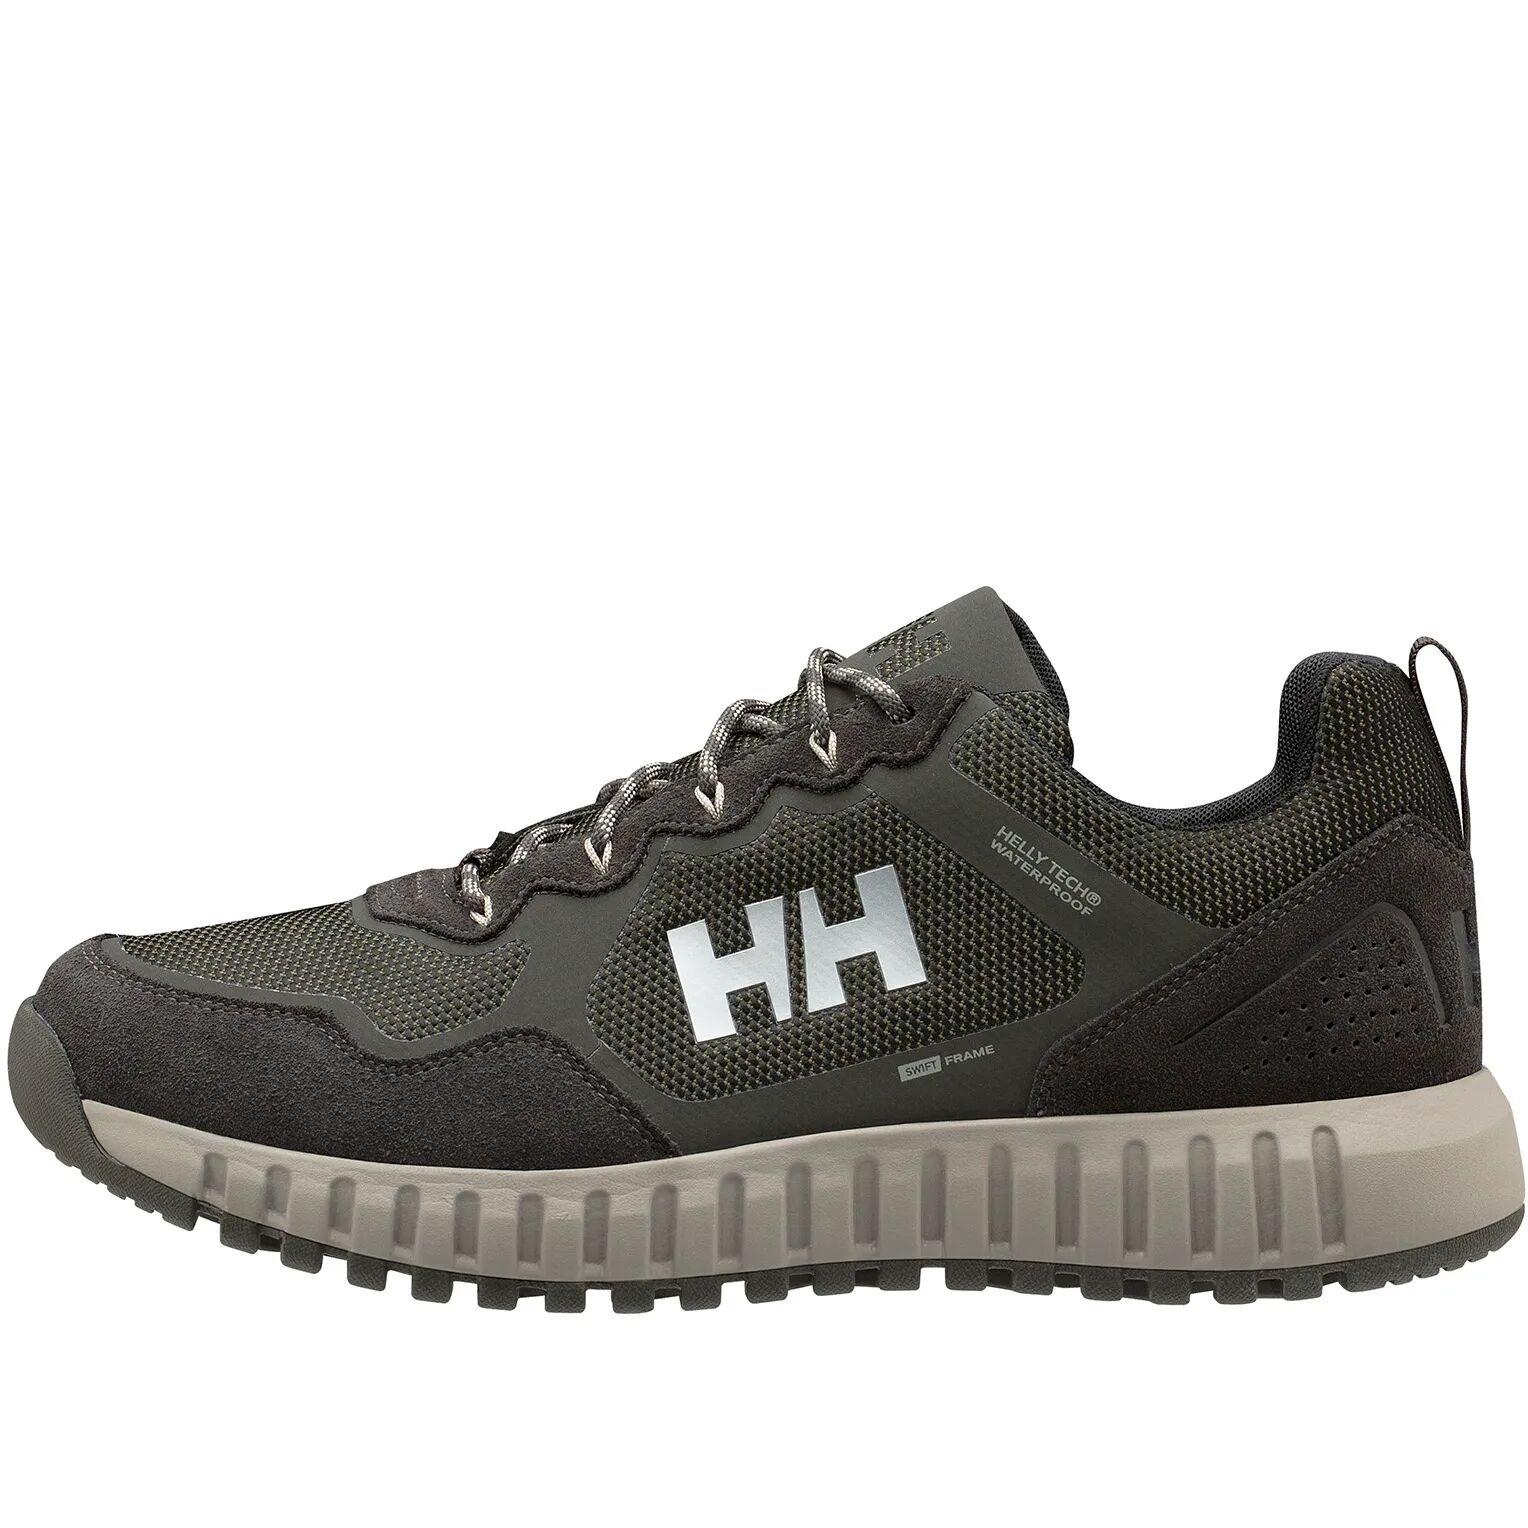 Helly Hansen Monashee Ullr Low Ht Hiking Boot Green 48/13